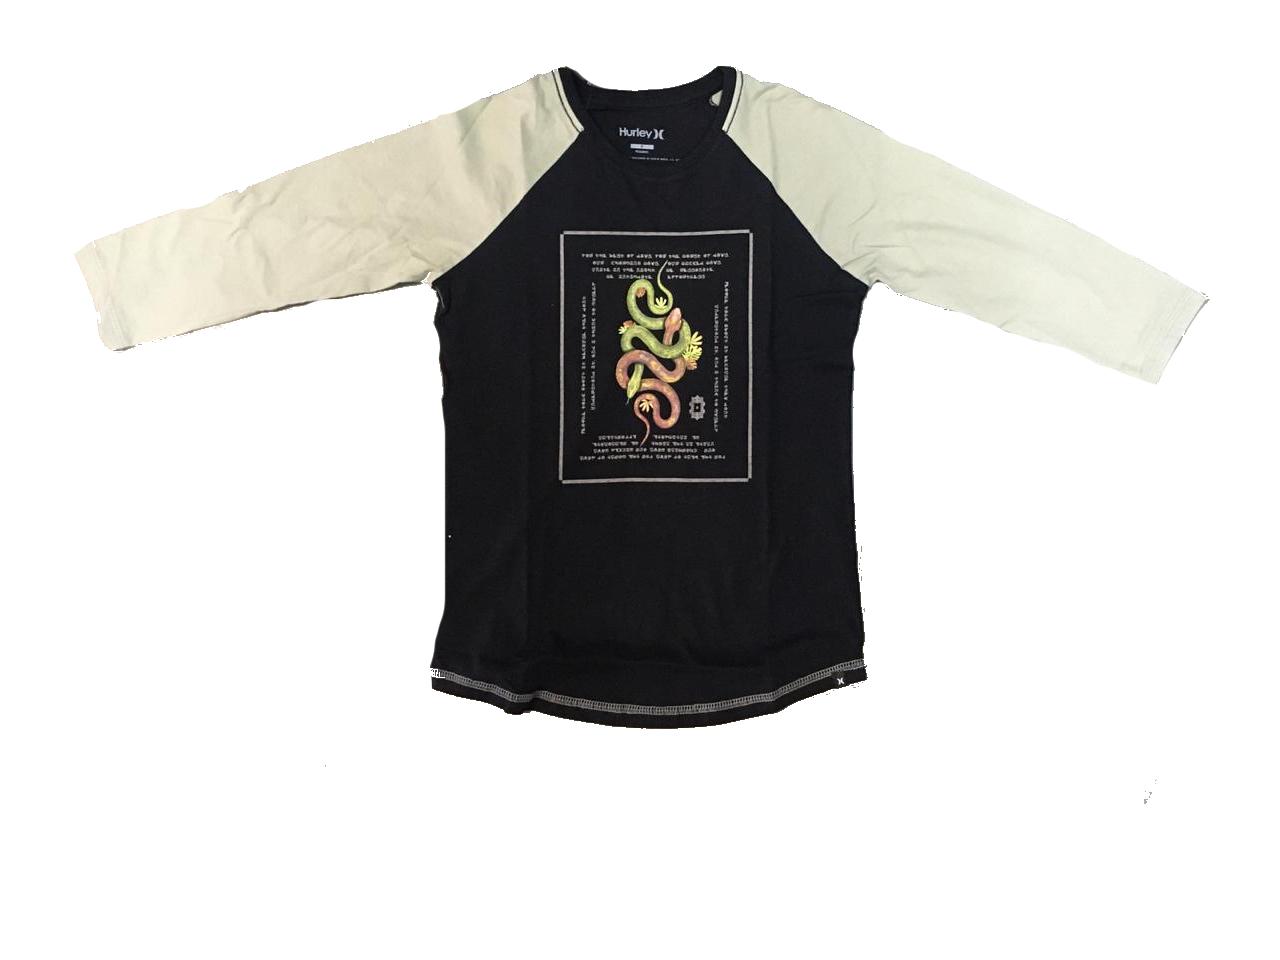 Camiseta Manga Longa Hurley Cobras  - Ondas do Sul